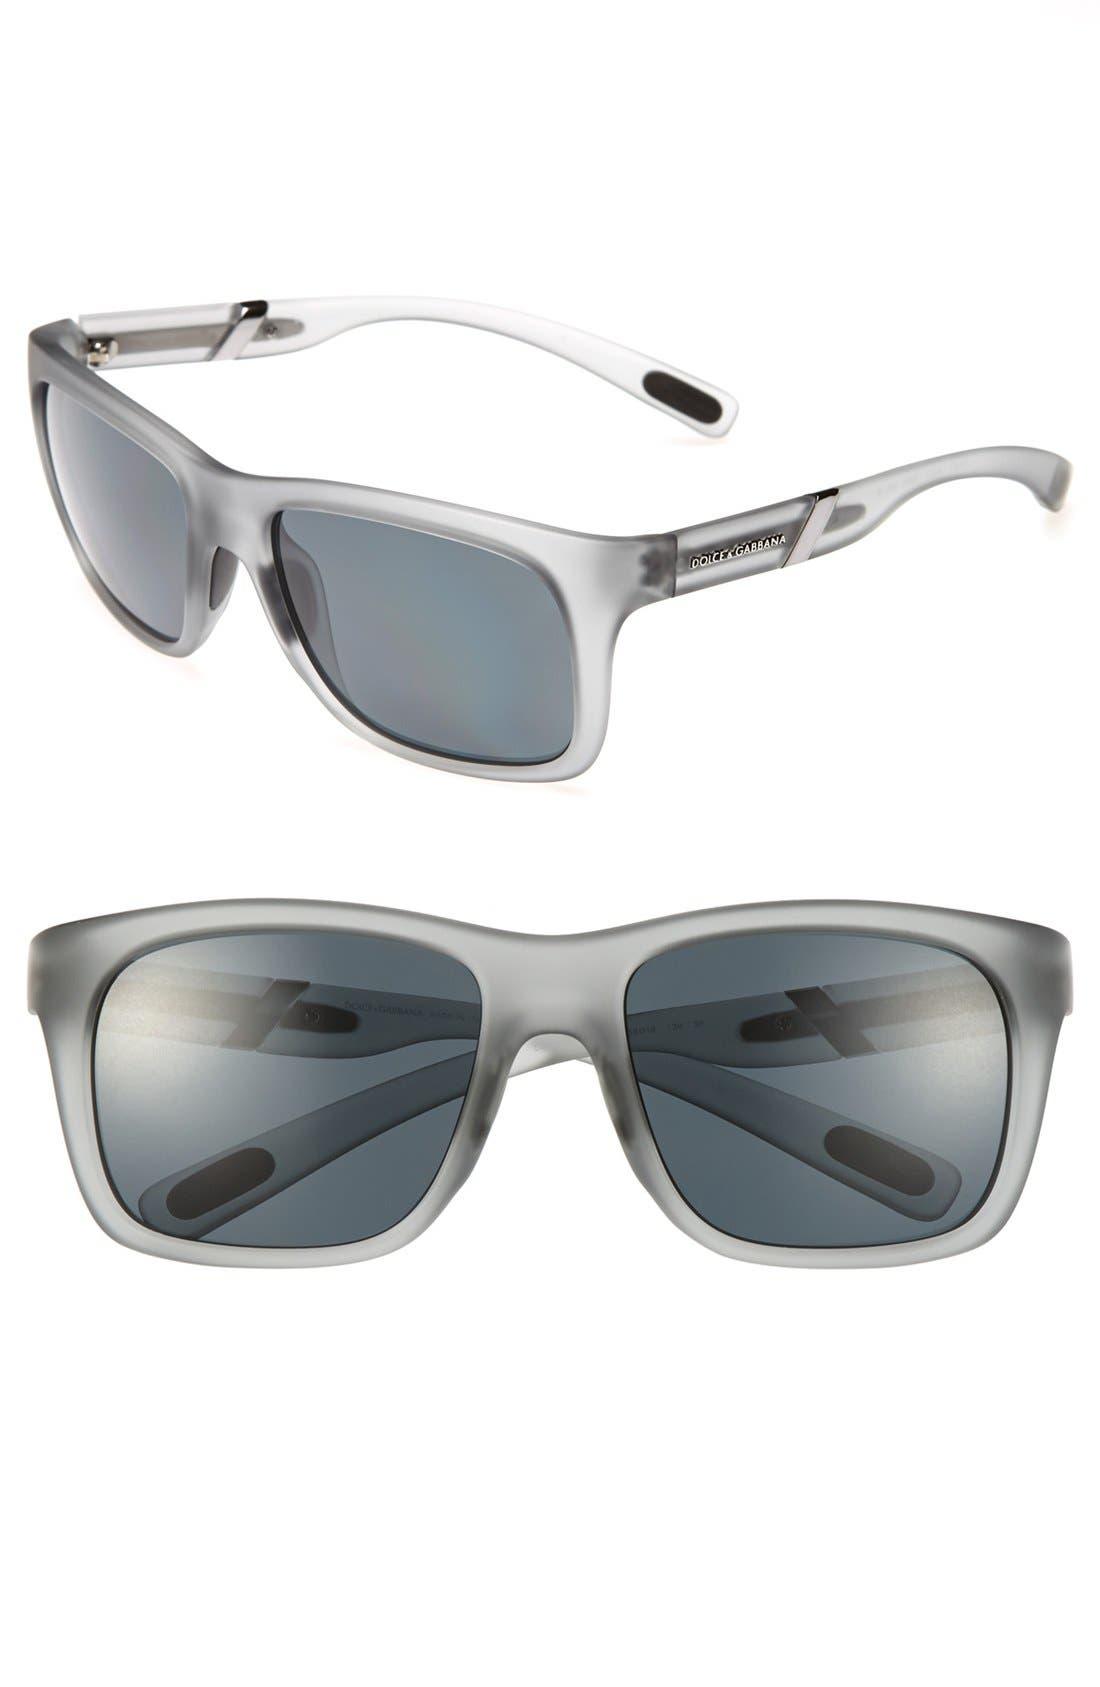 Main Image - Dolce&Gabbana 'Gym Classic' 56mm Sunglasses